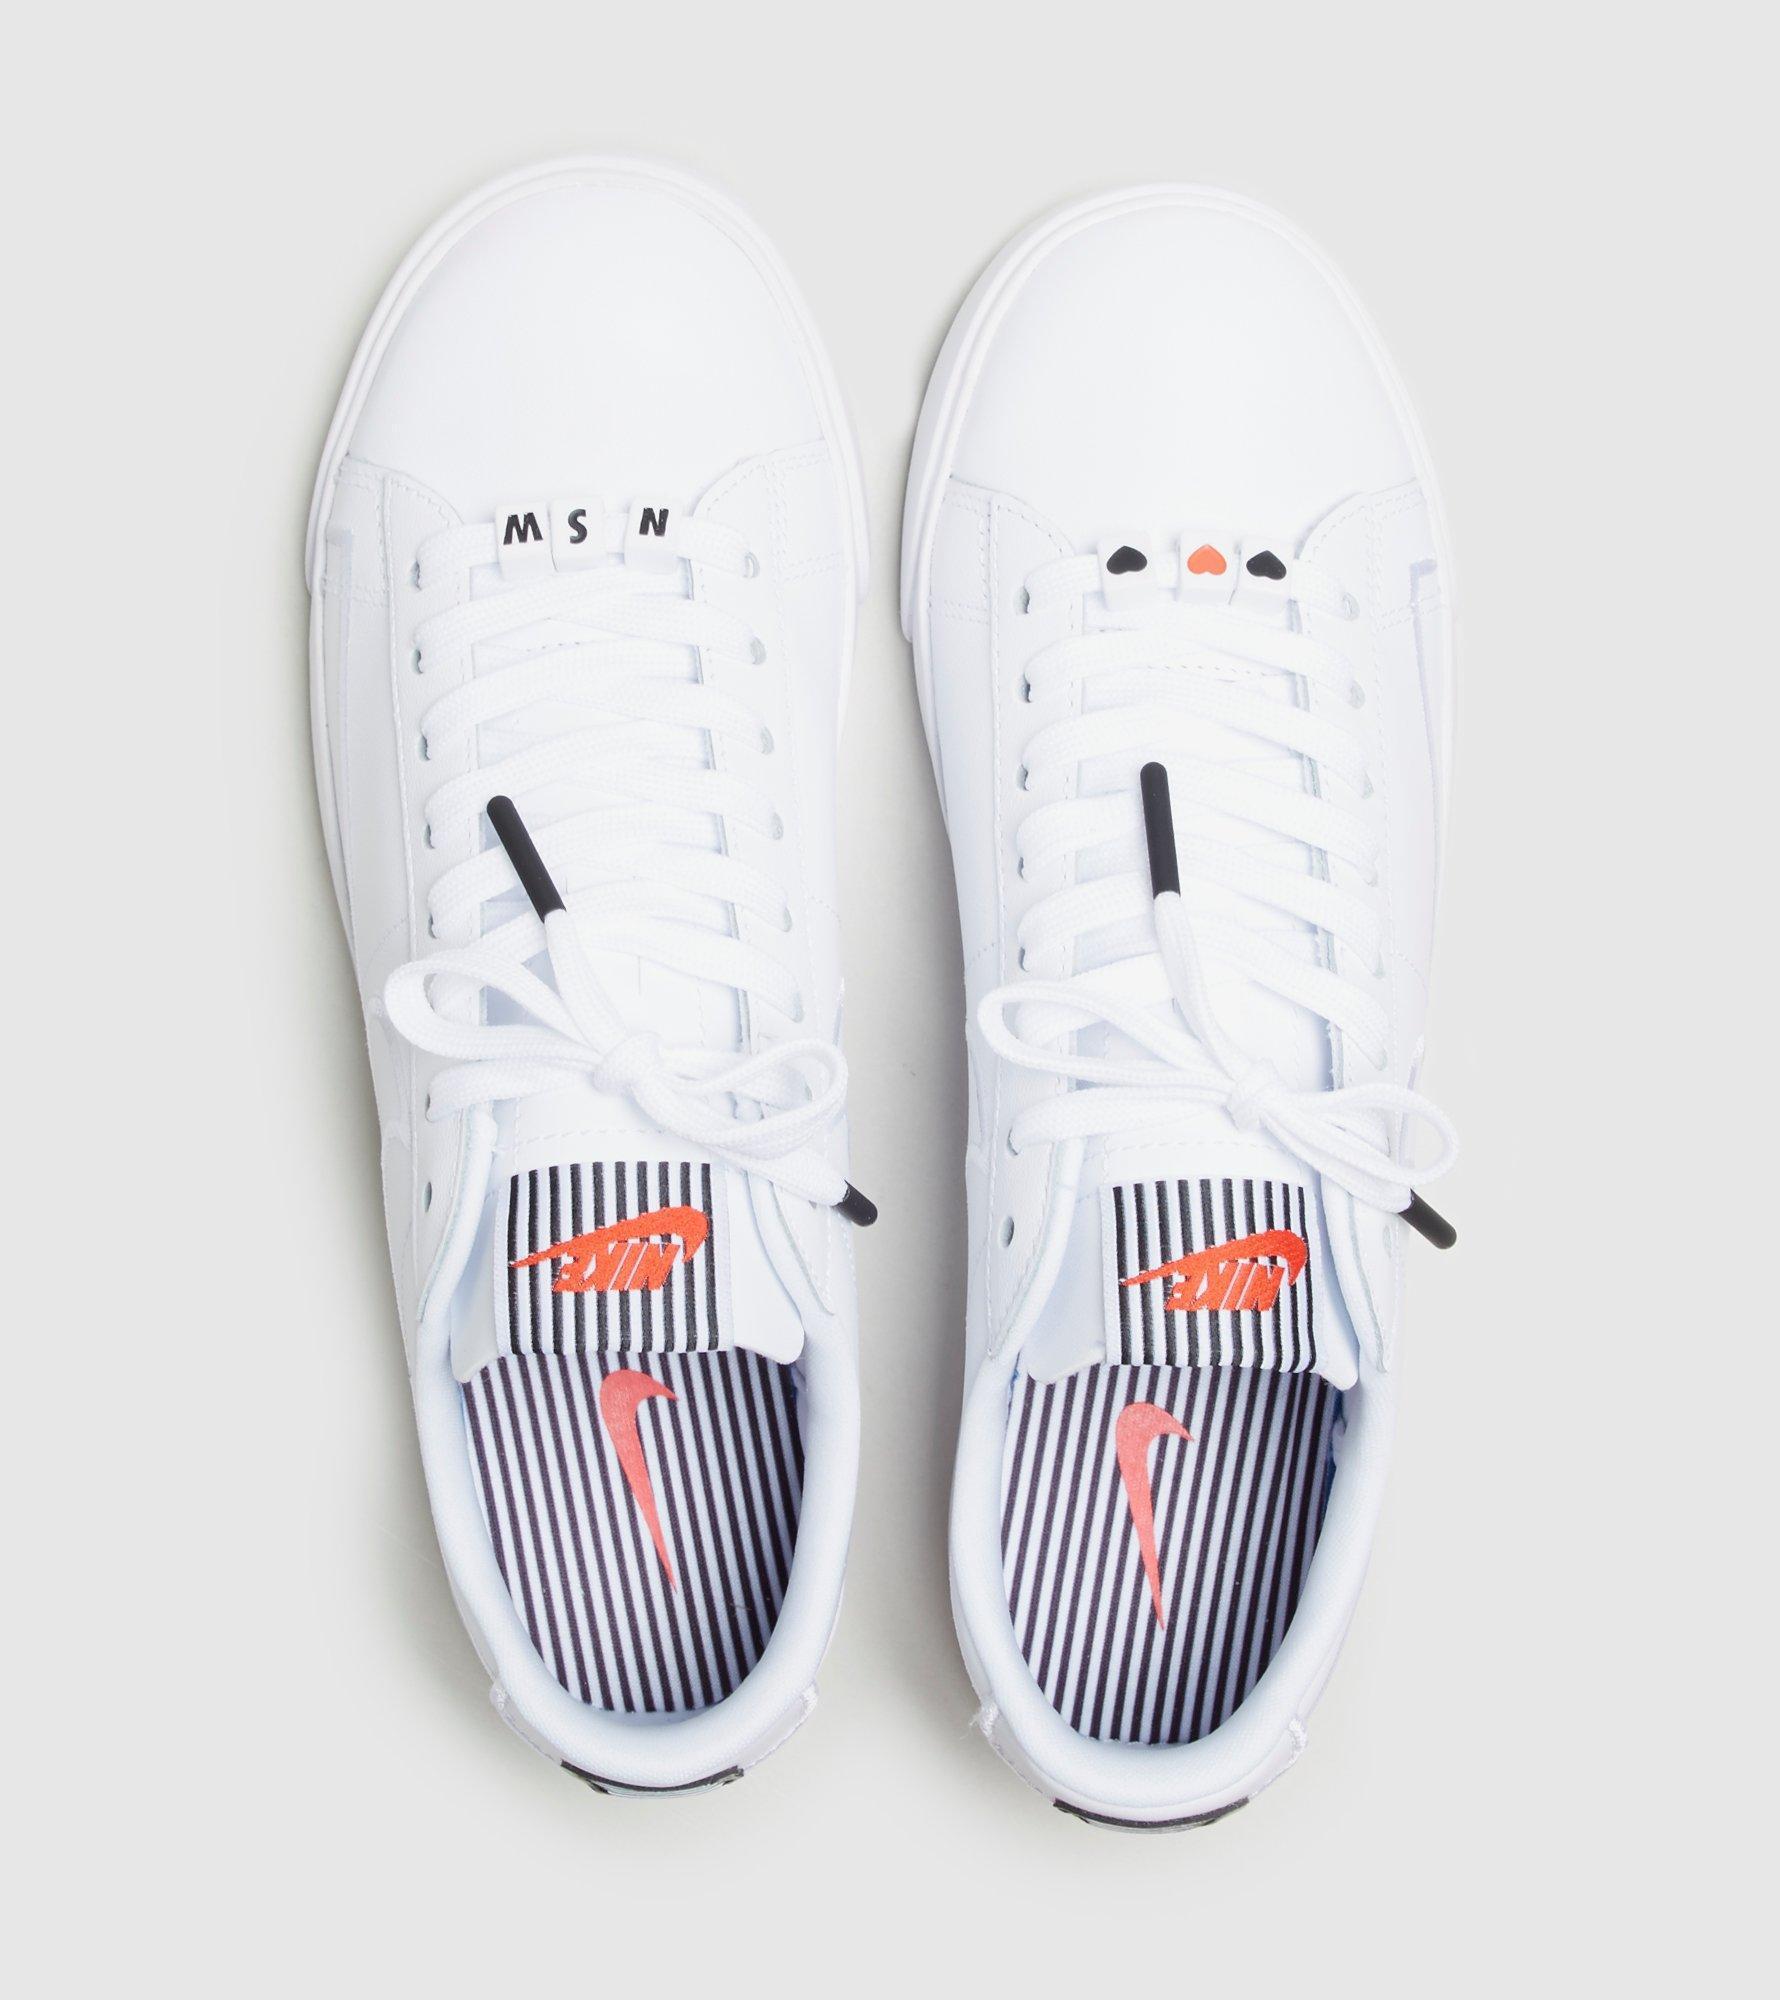 7cdd3ba41ce31 ... Lyst Nike Blazer Low Lx valentine s Day Women s in White for Men